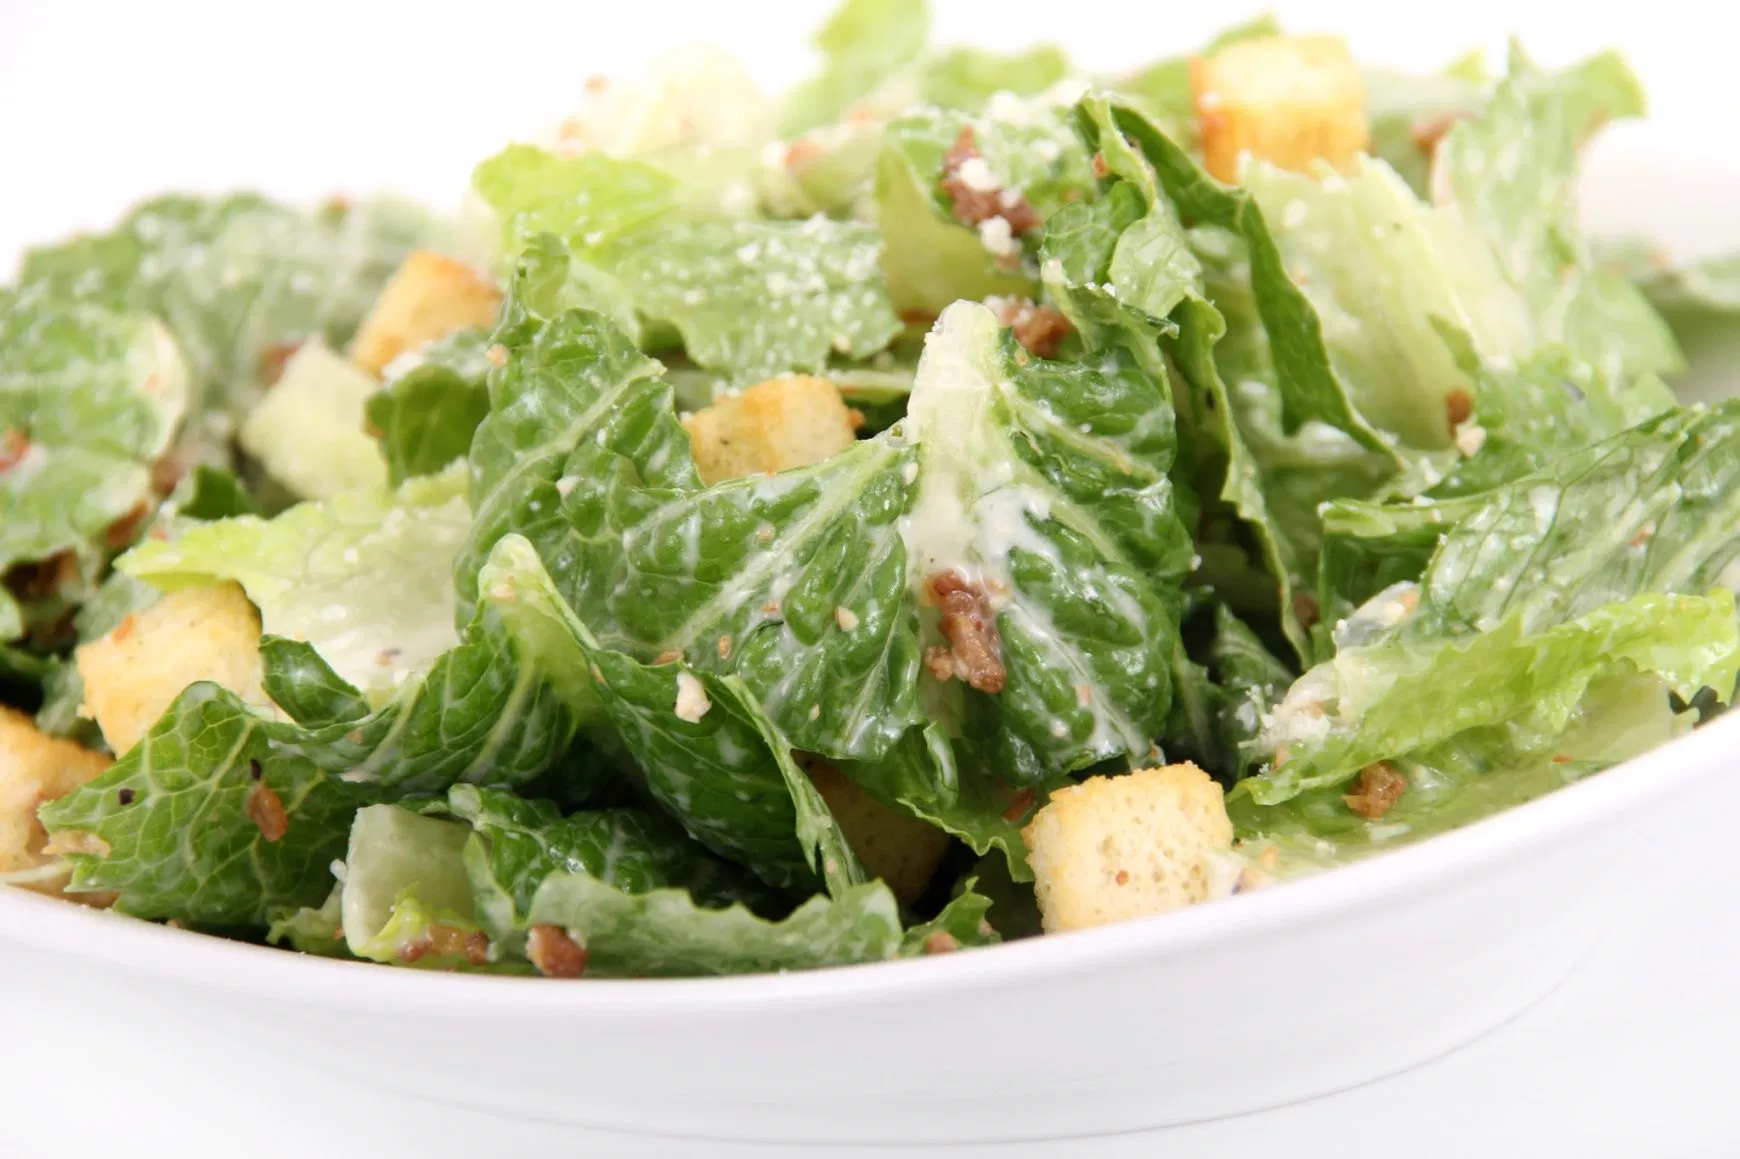 Summer Salad Recipes From Coast to Coast   Summer salad ...